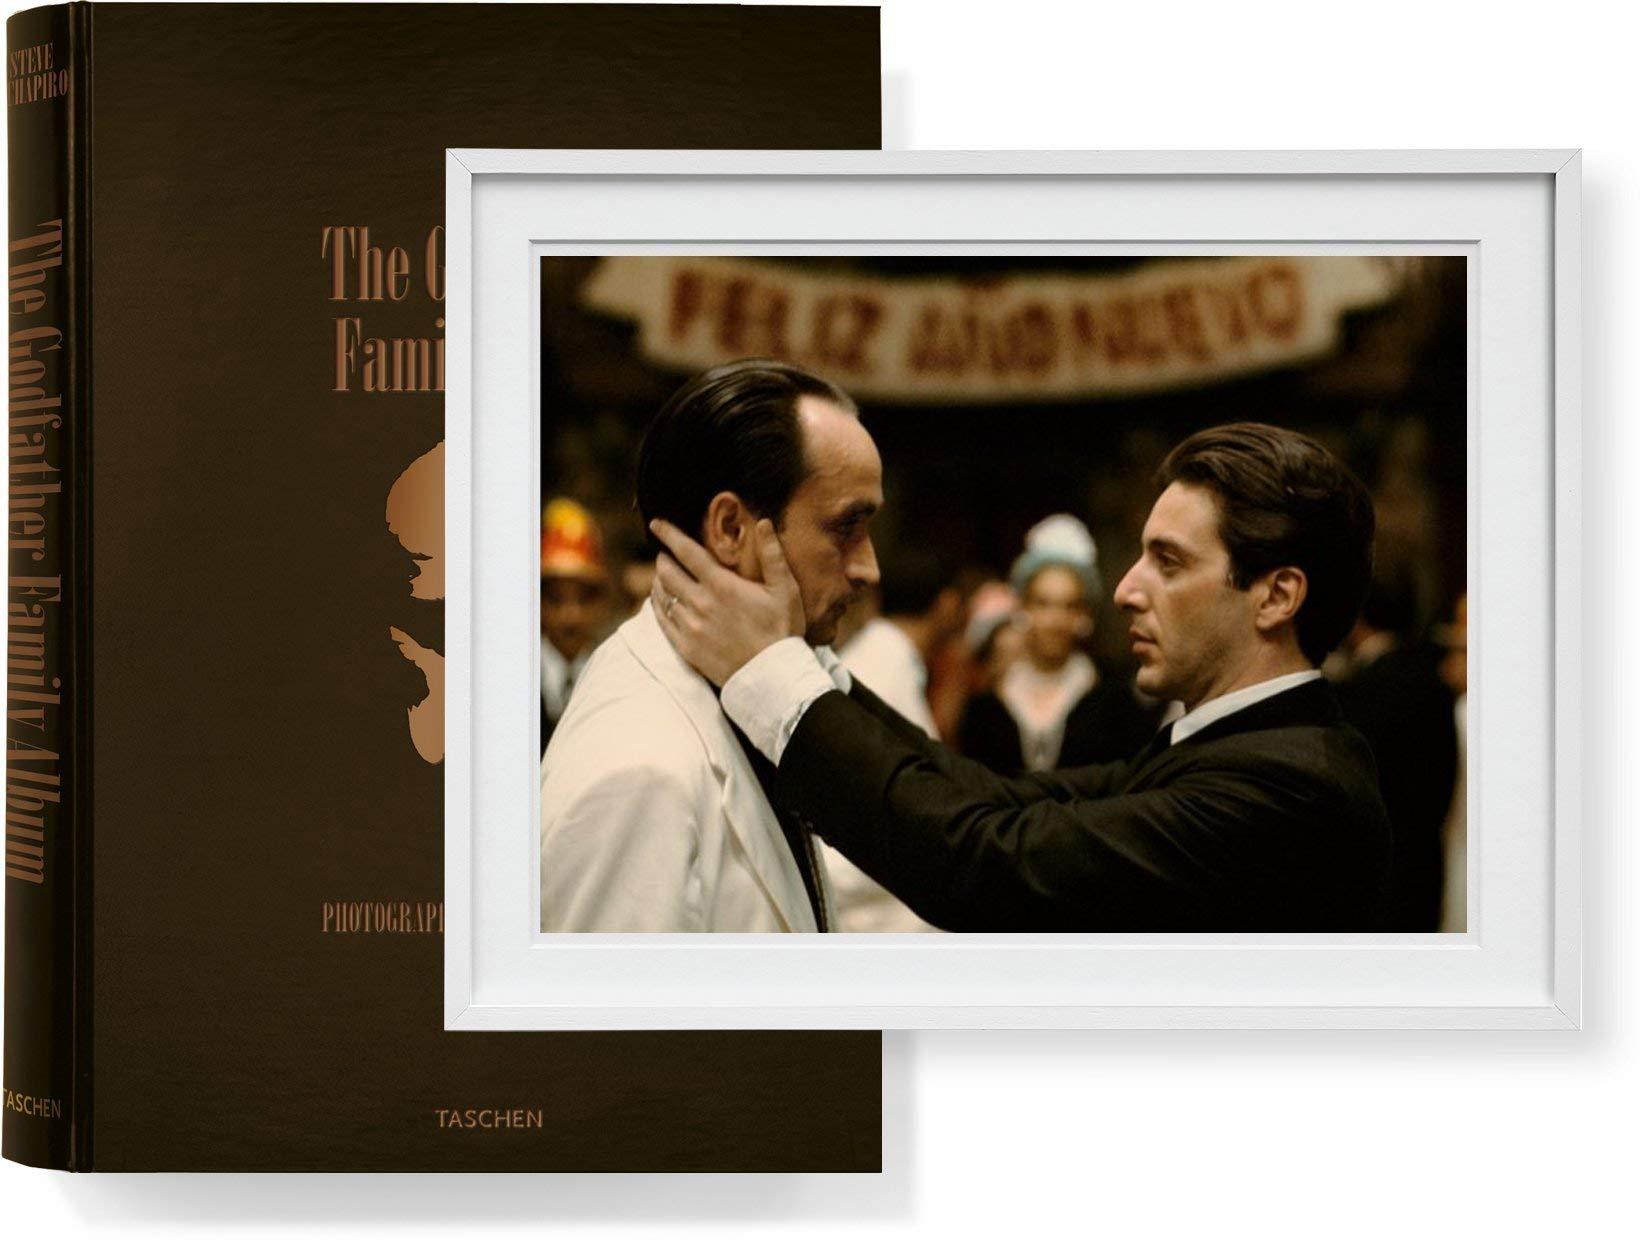 Steve Schapiro - The Godfather Family Album: Art Edition B. Kunstdruck